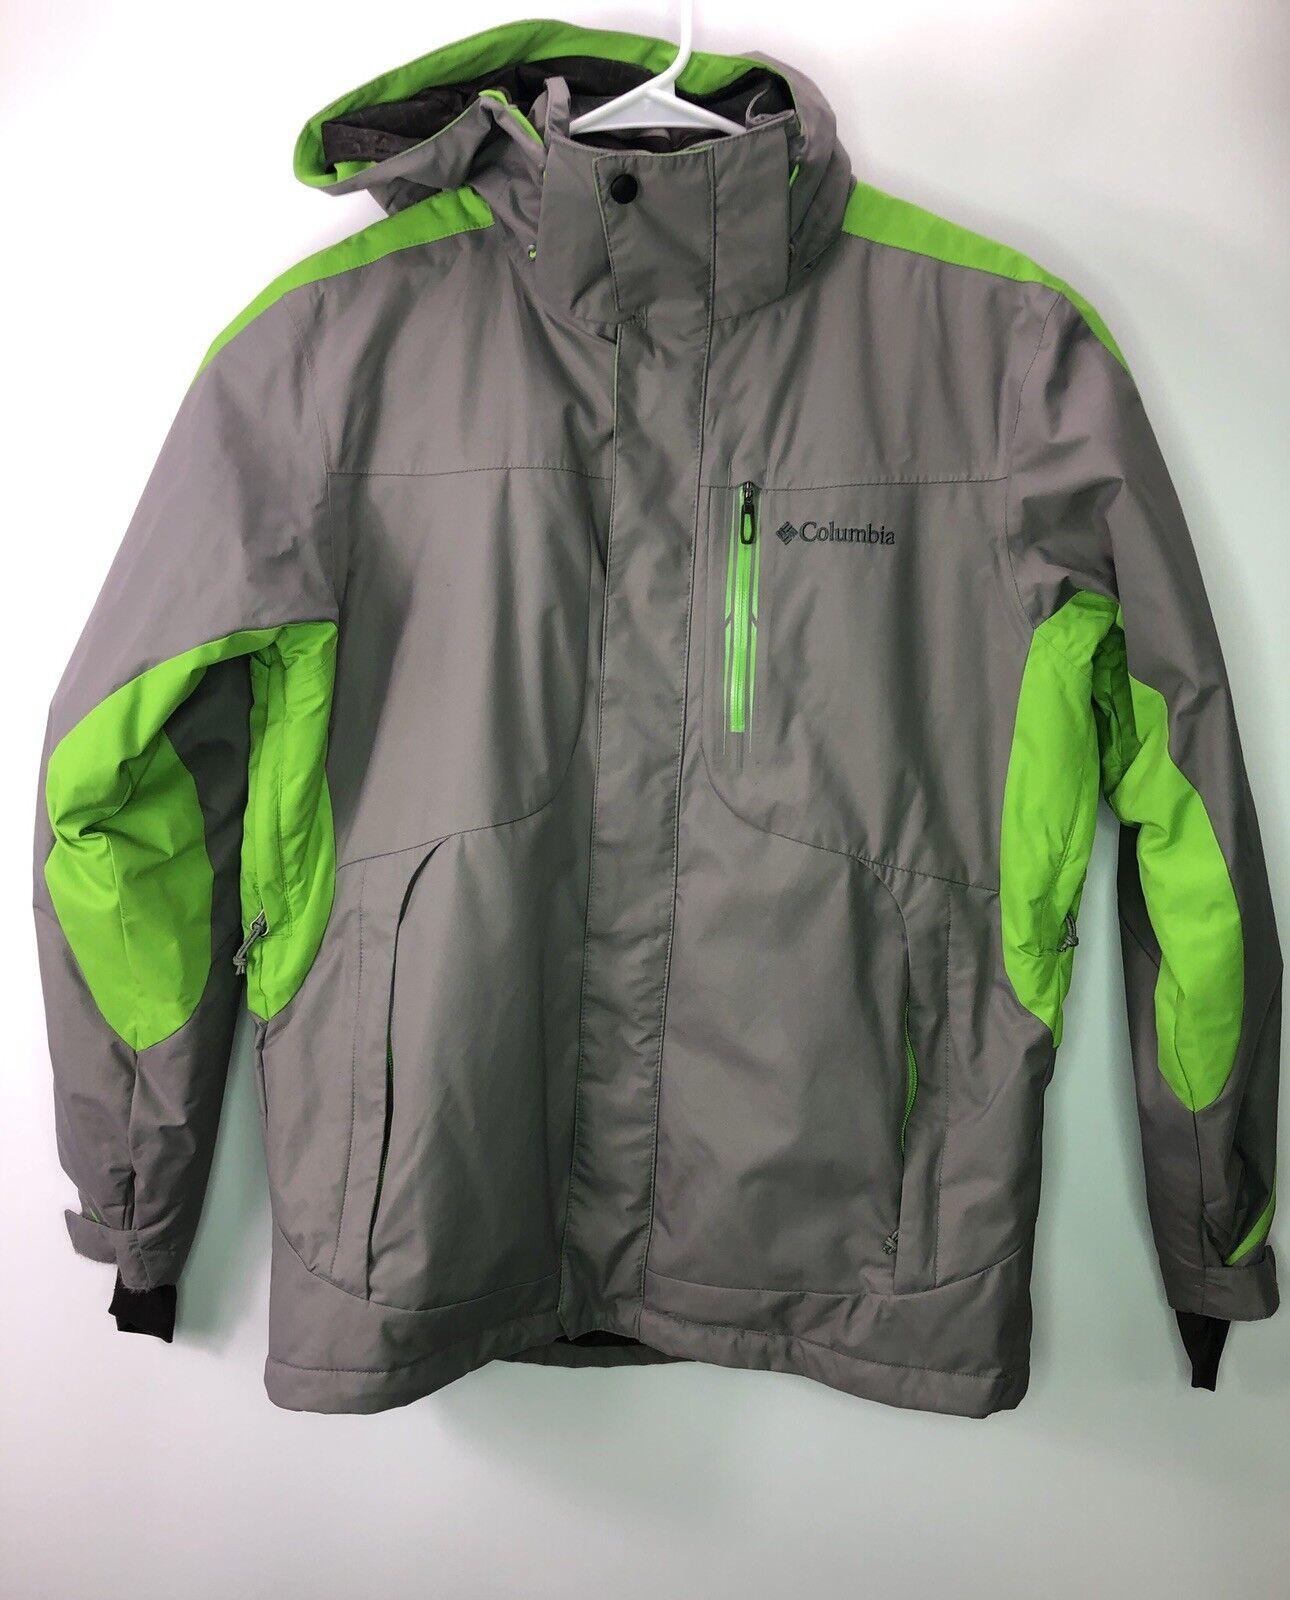 Columbia Omniheat Waterproof Shell herren jacke Hooded  grau Grün M